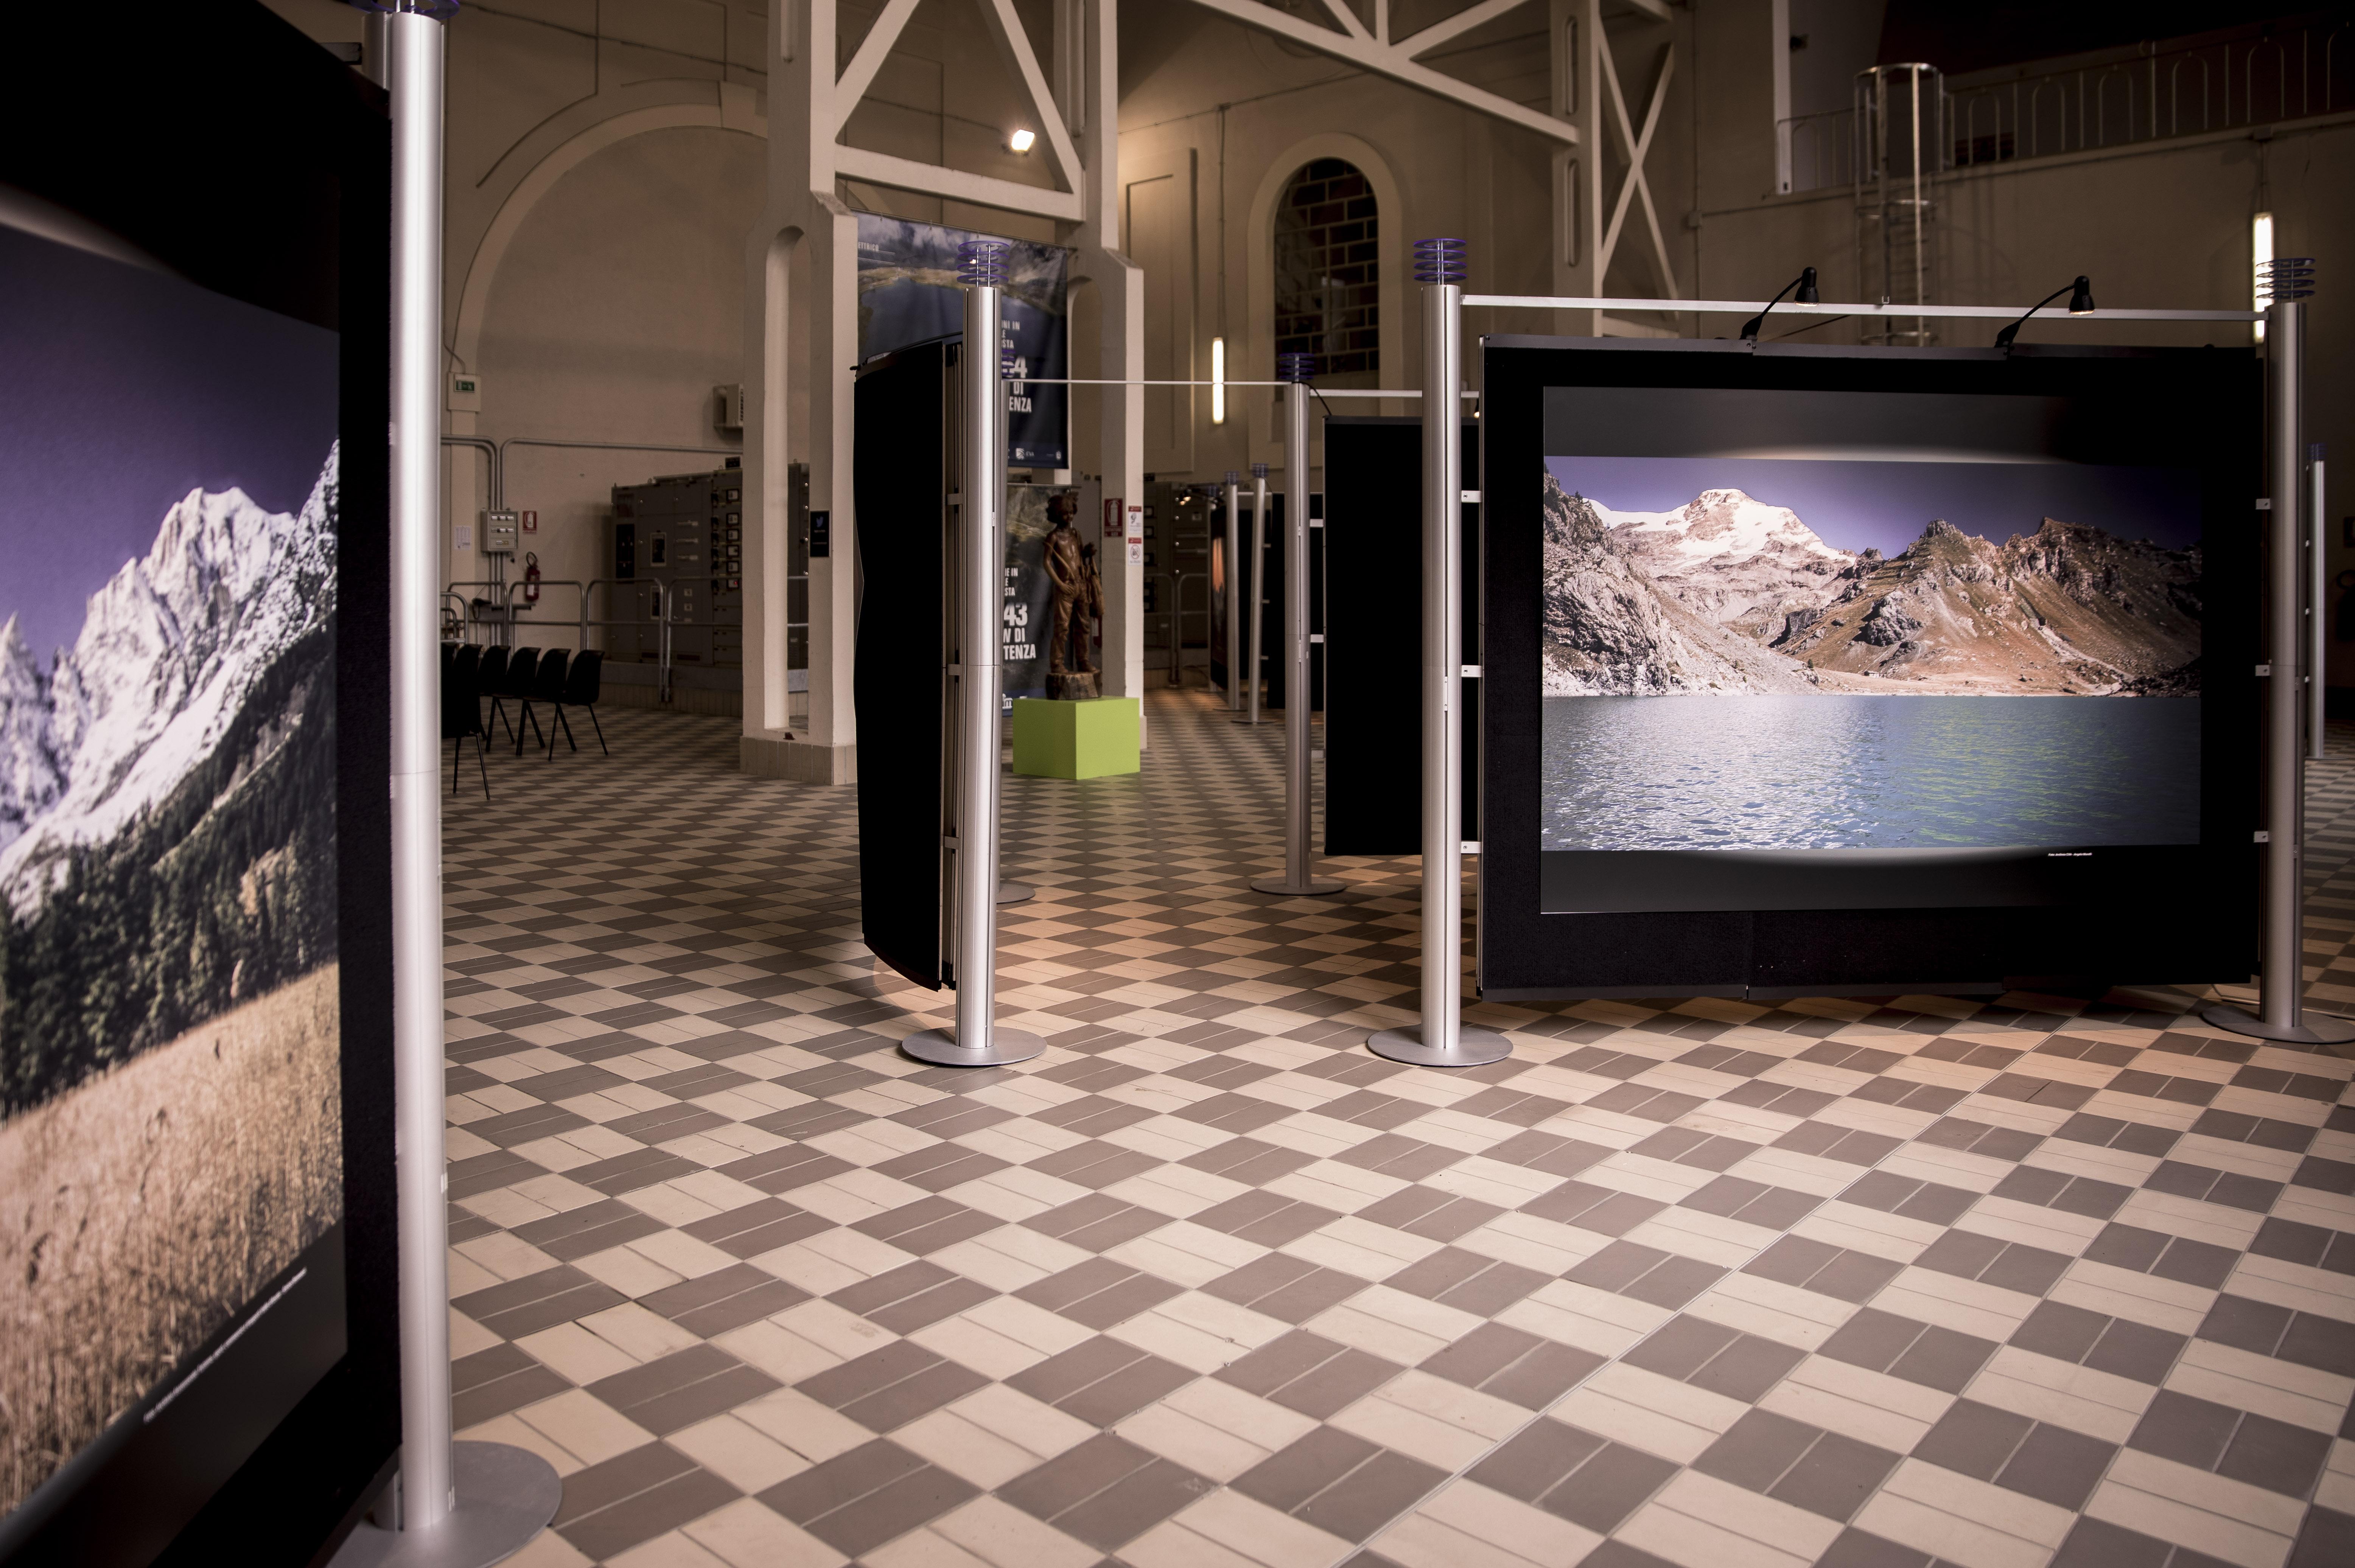 Mostra Montagne Artigiane - Maen 2018